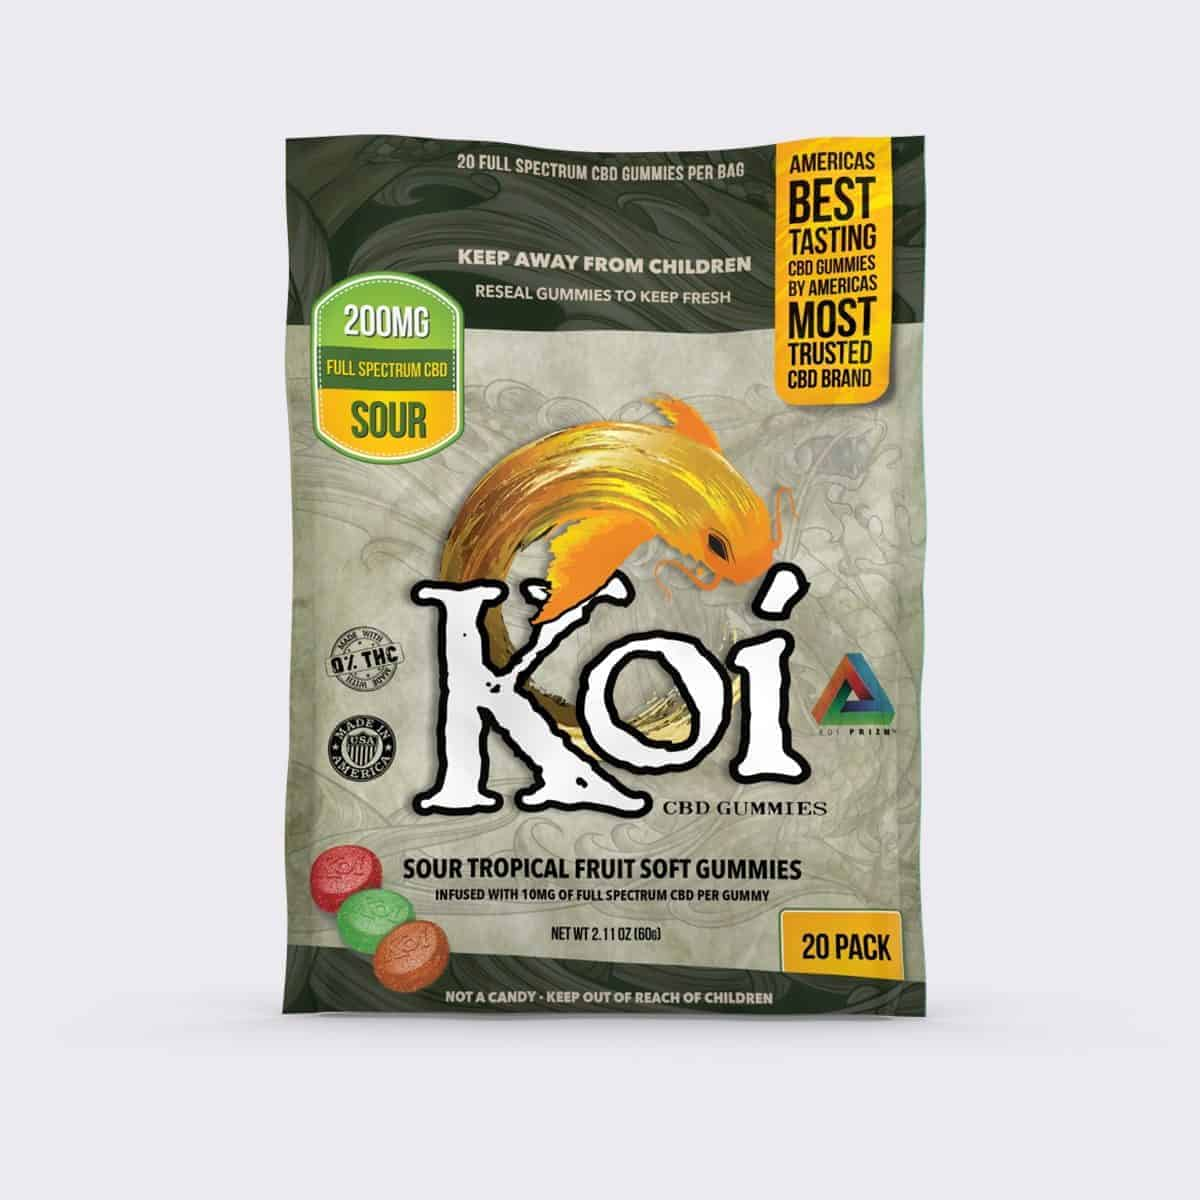 KOI CBD SOUR TROPICAL FRUIT SOFT GUMMIES - 20pc